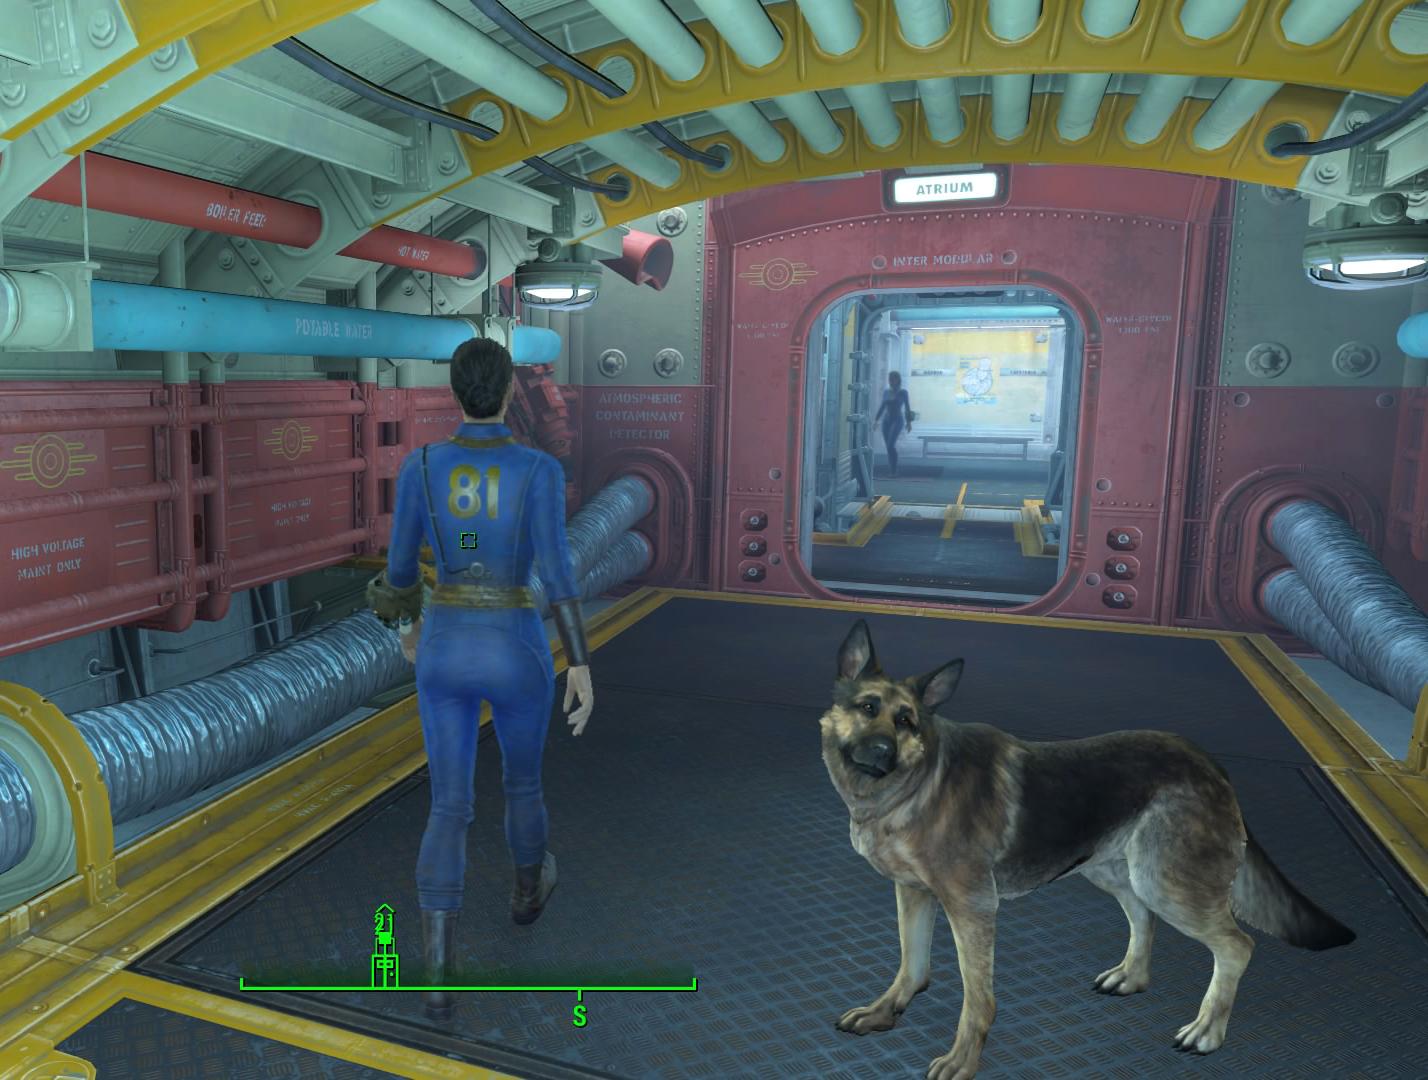 Fallout 4 Vault inhabitants